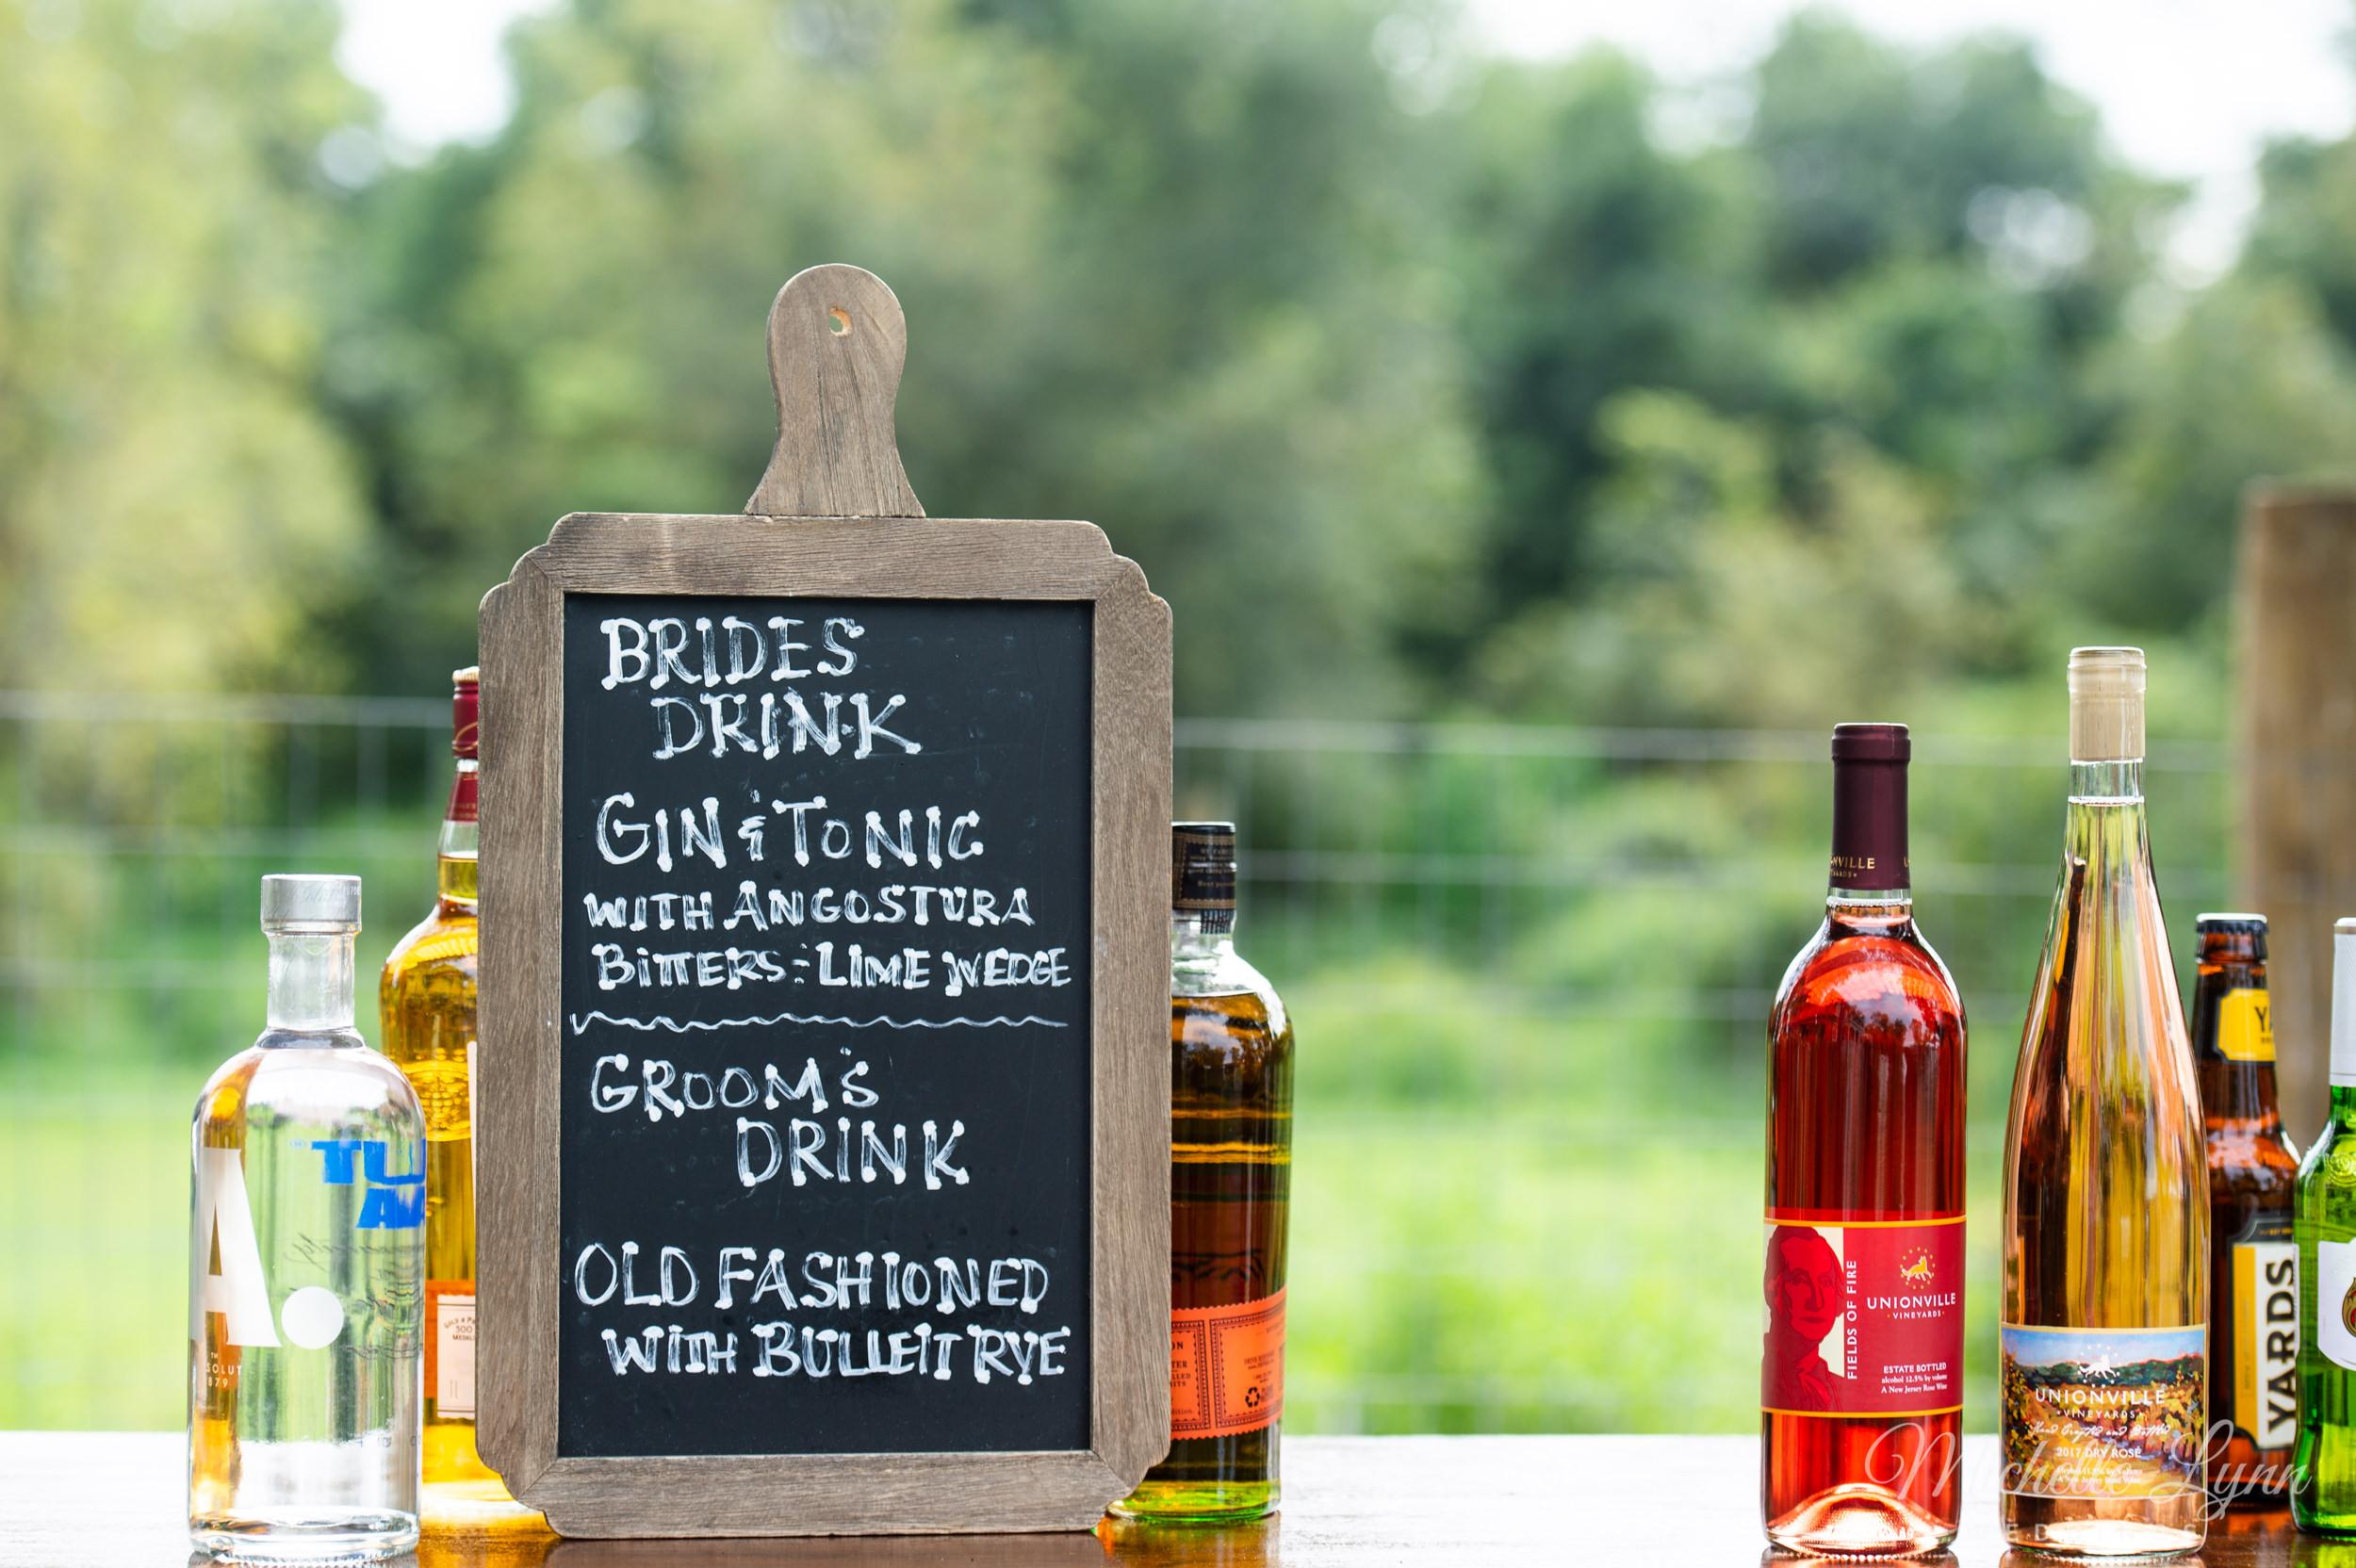 mlw-unionville-vineyards-nj-wedding-photography-75.jpg